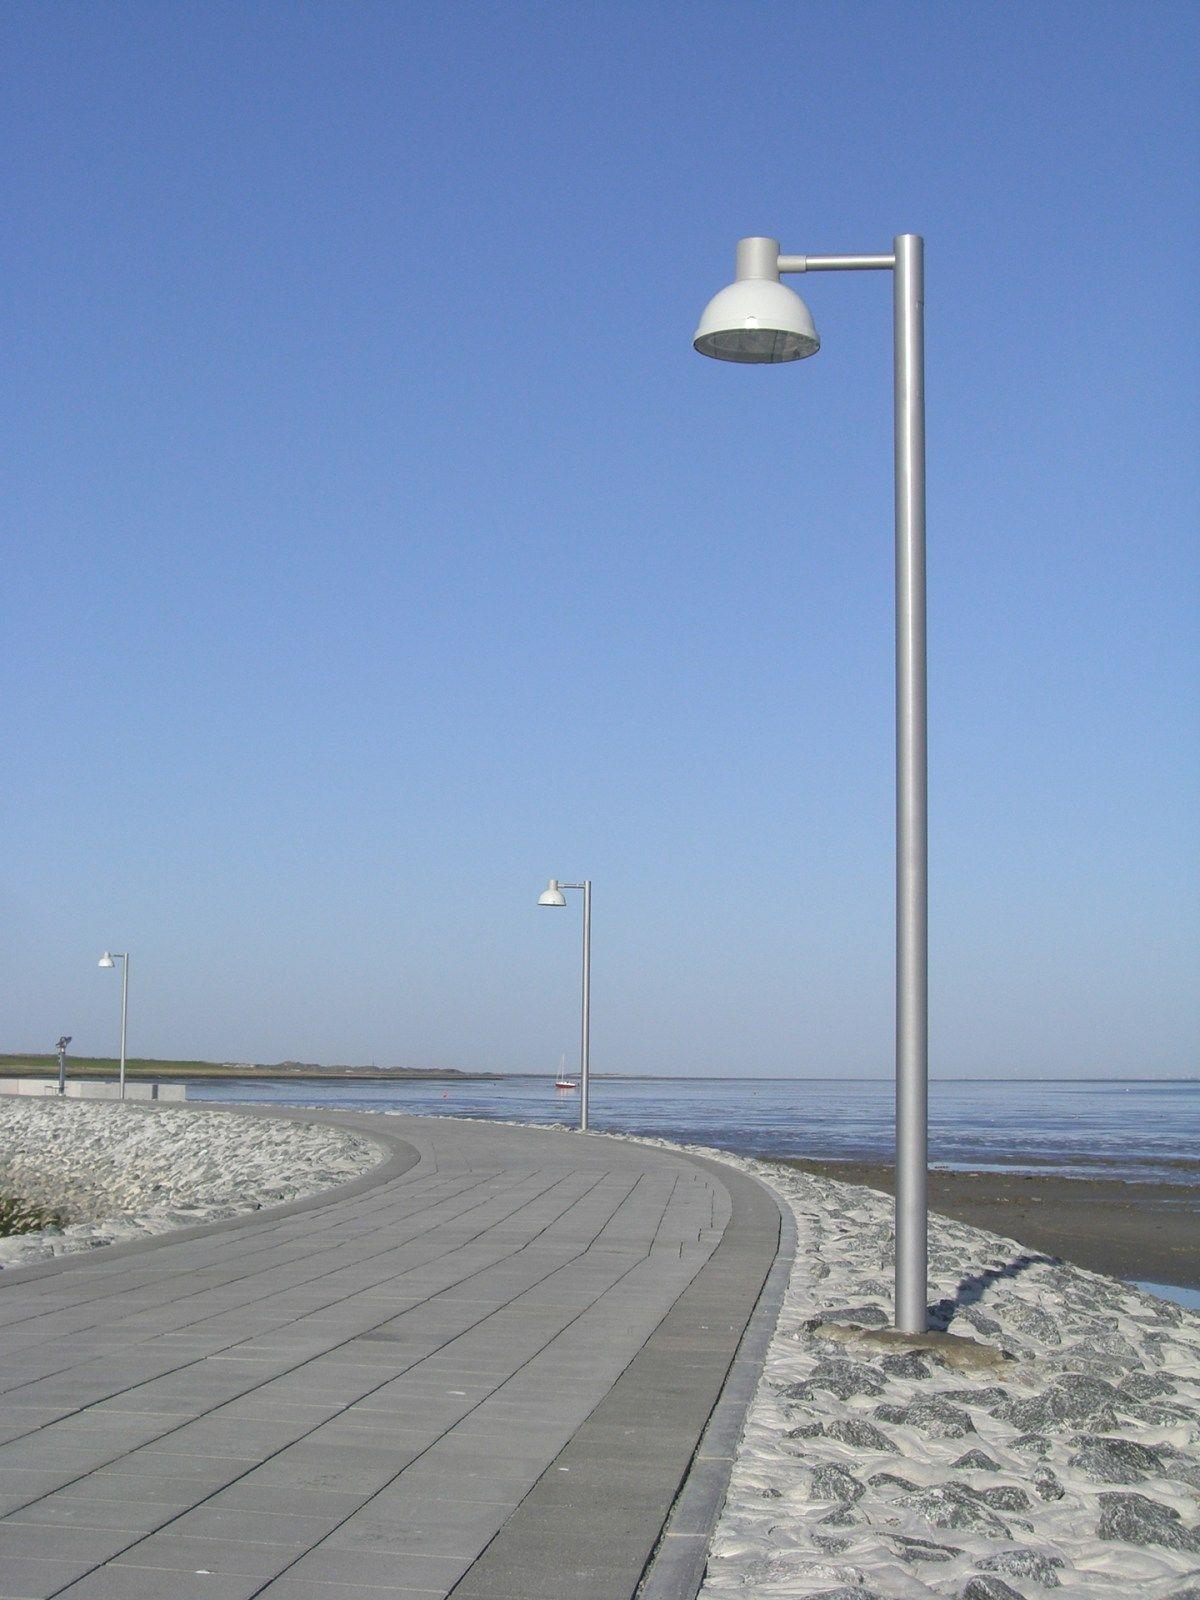 Lp icon post by louis poulsen exterior pedestrian post - Commercial exterior lighting manufacturers ...